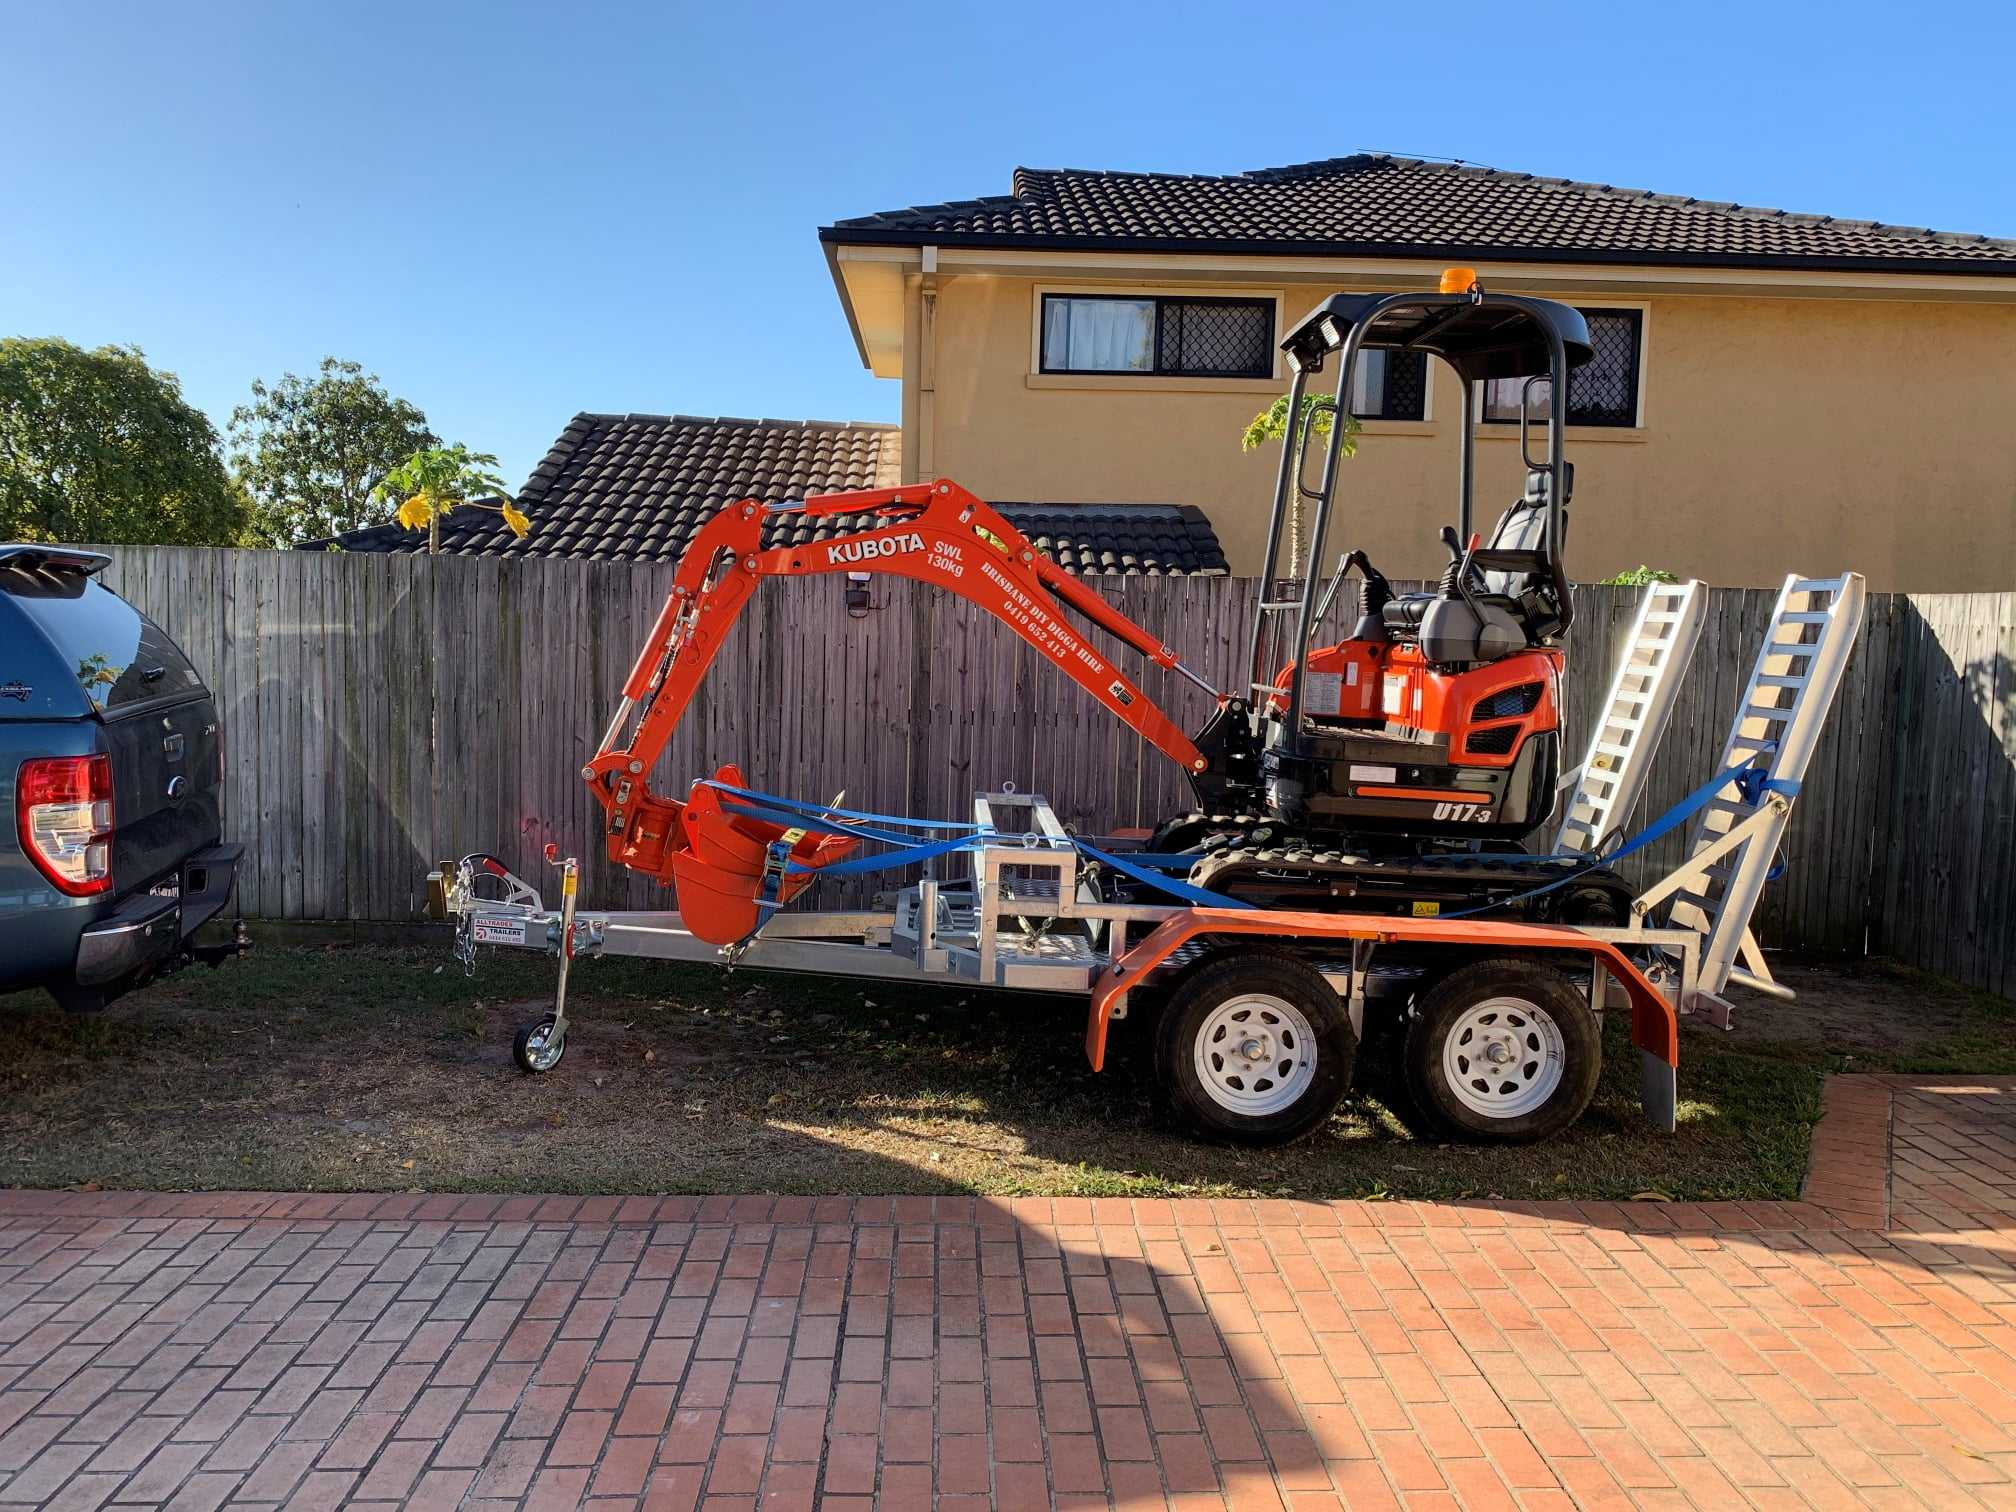 Kubota U17-3  - 1.7T 2019 ZERO tail swing Mini Excavator for dry hire - Parkinson QLD